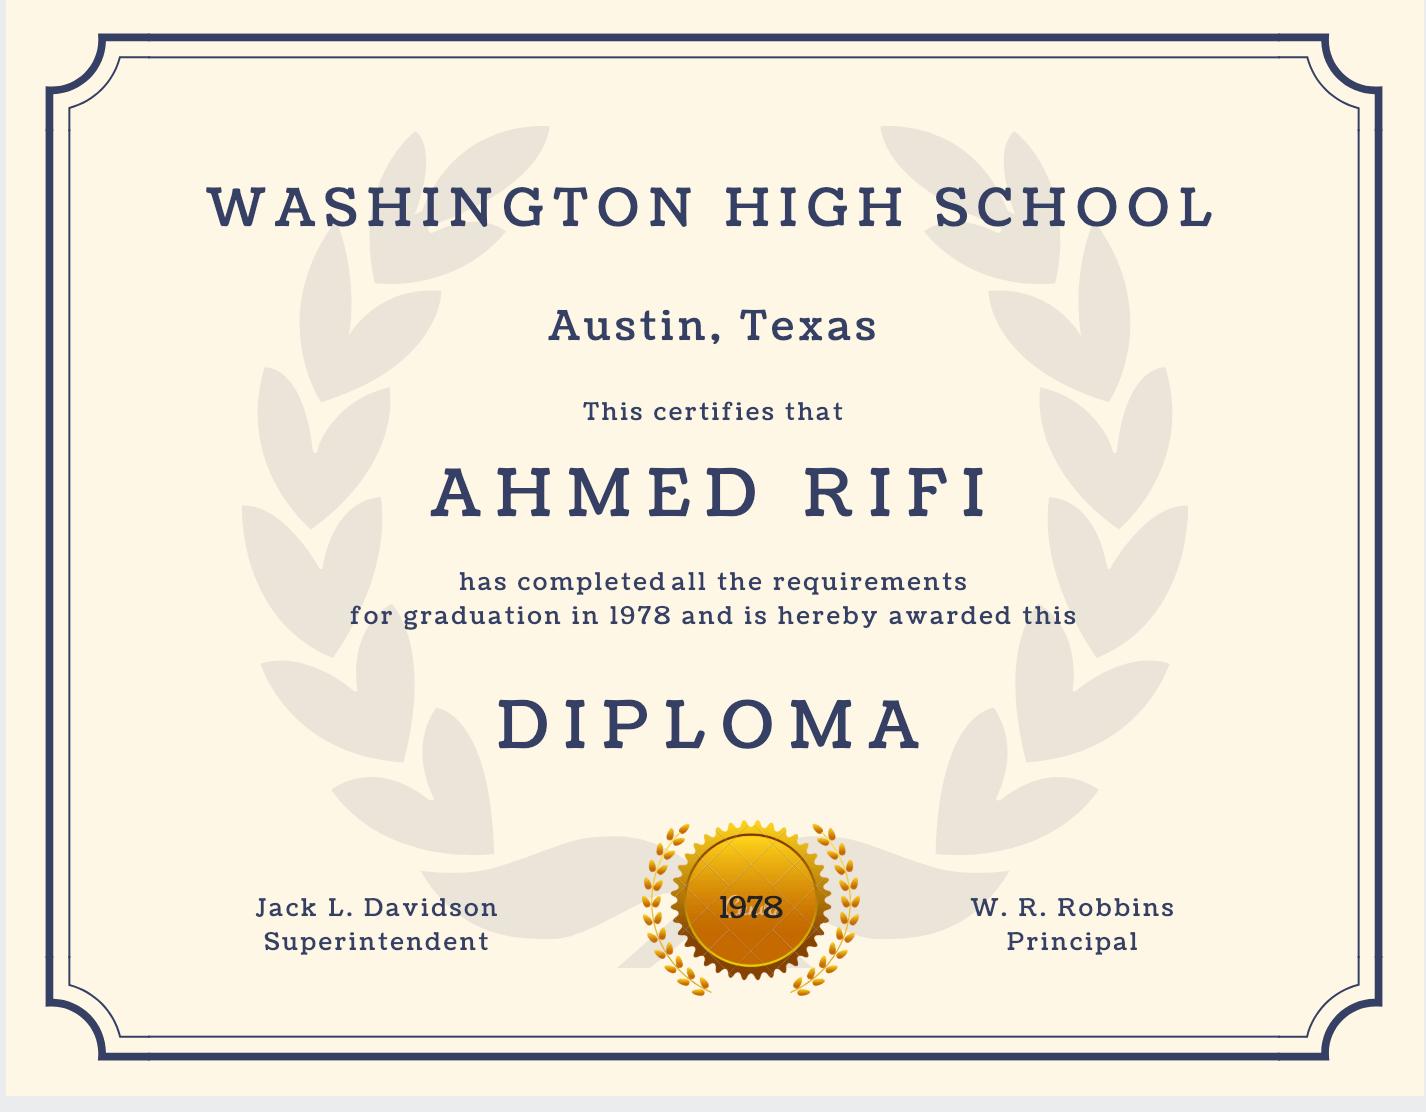 60+ Free High School Diploma Template - Printable Certificates!! - Free Printable High School Diploma Templates